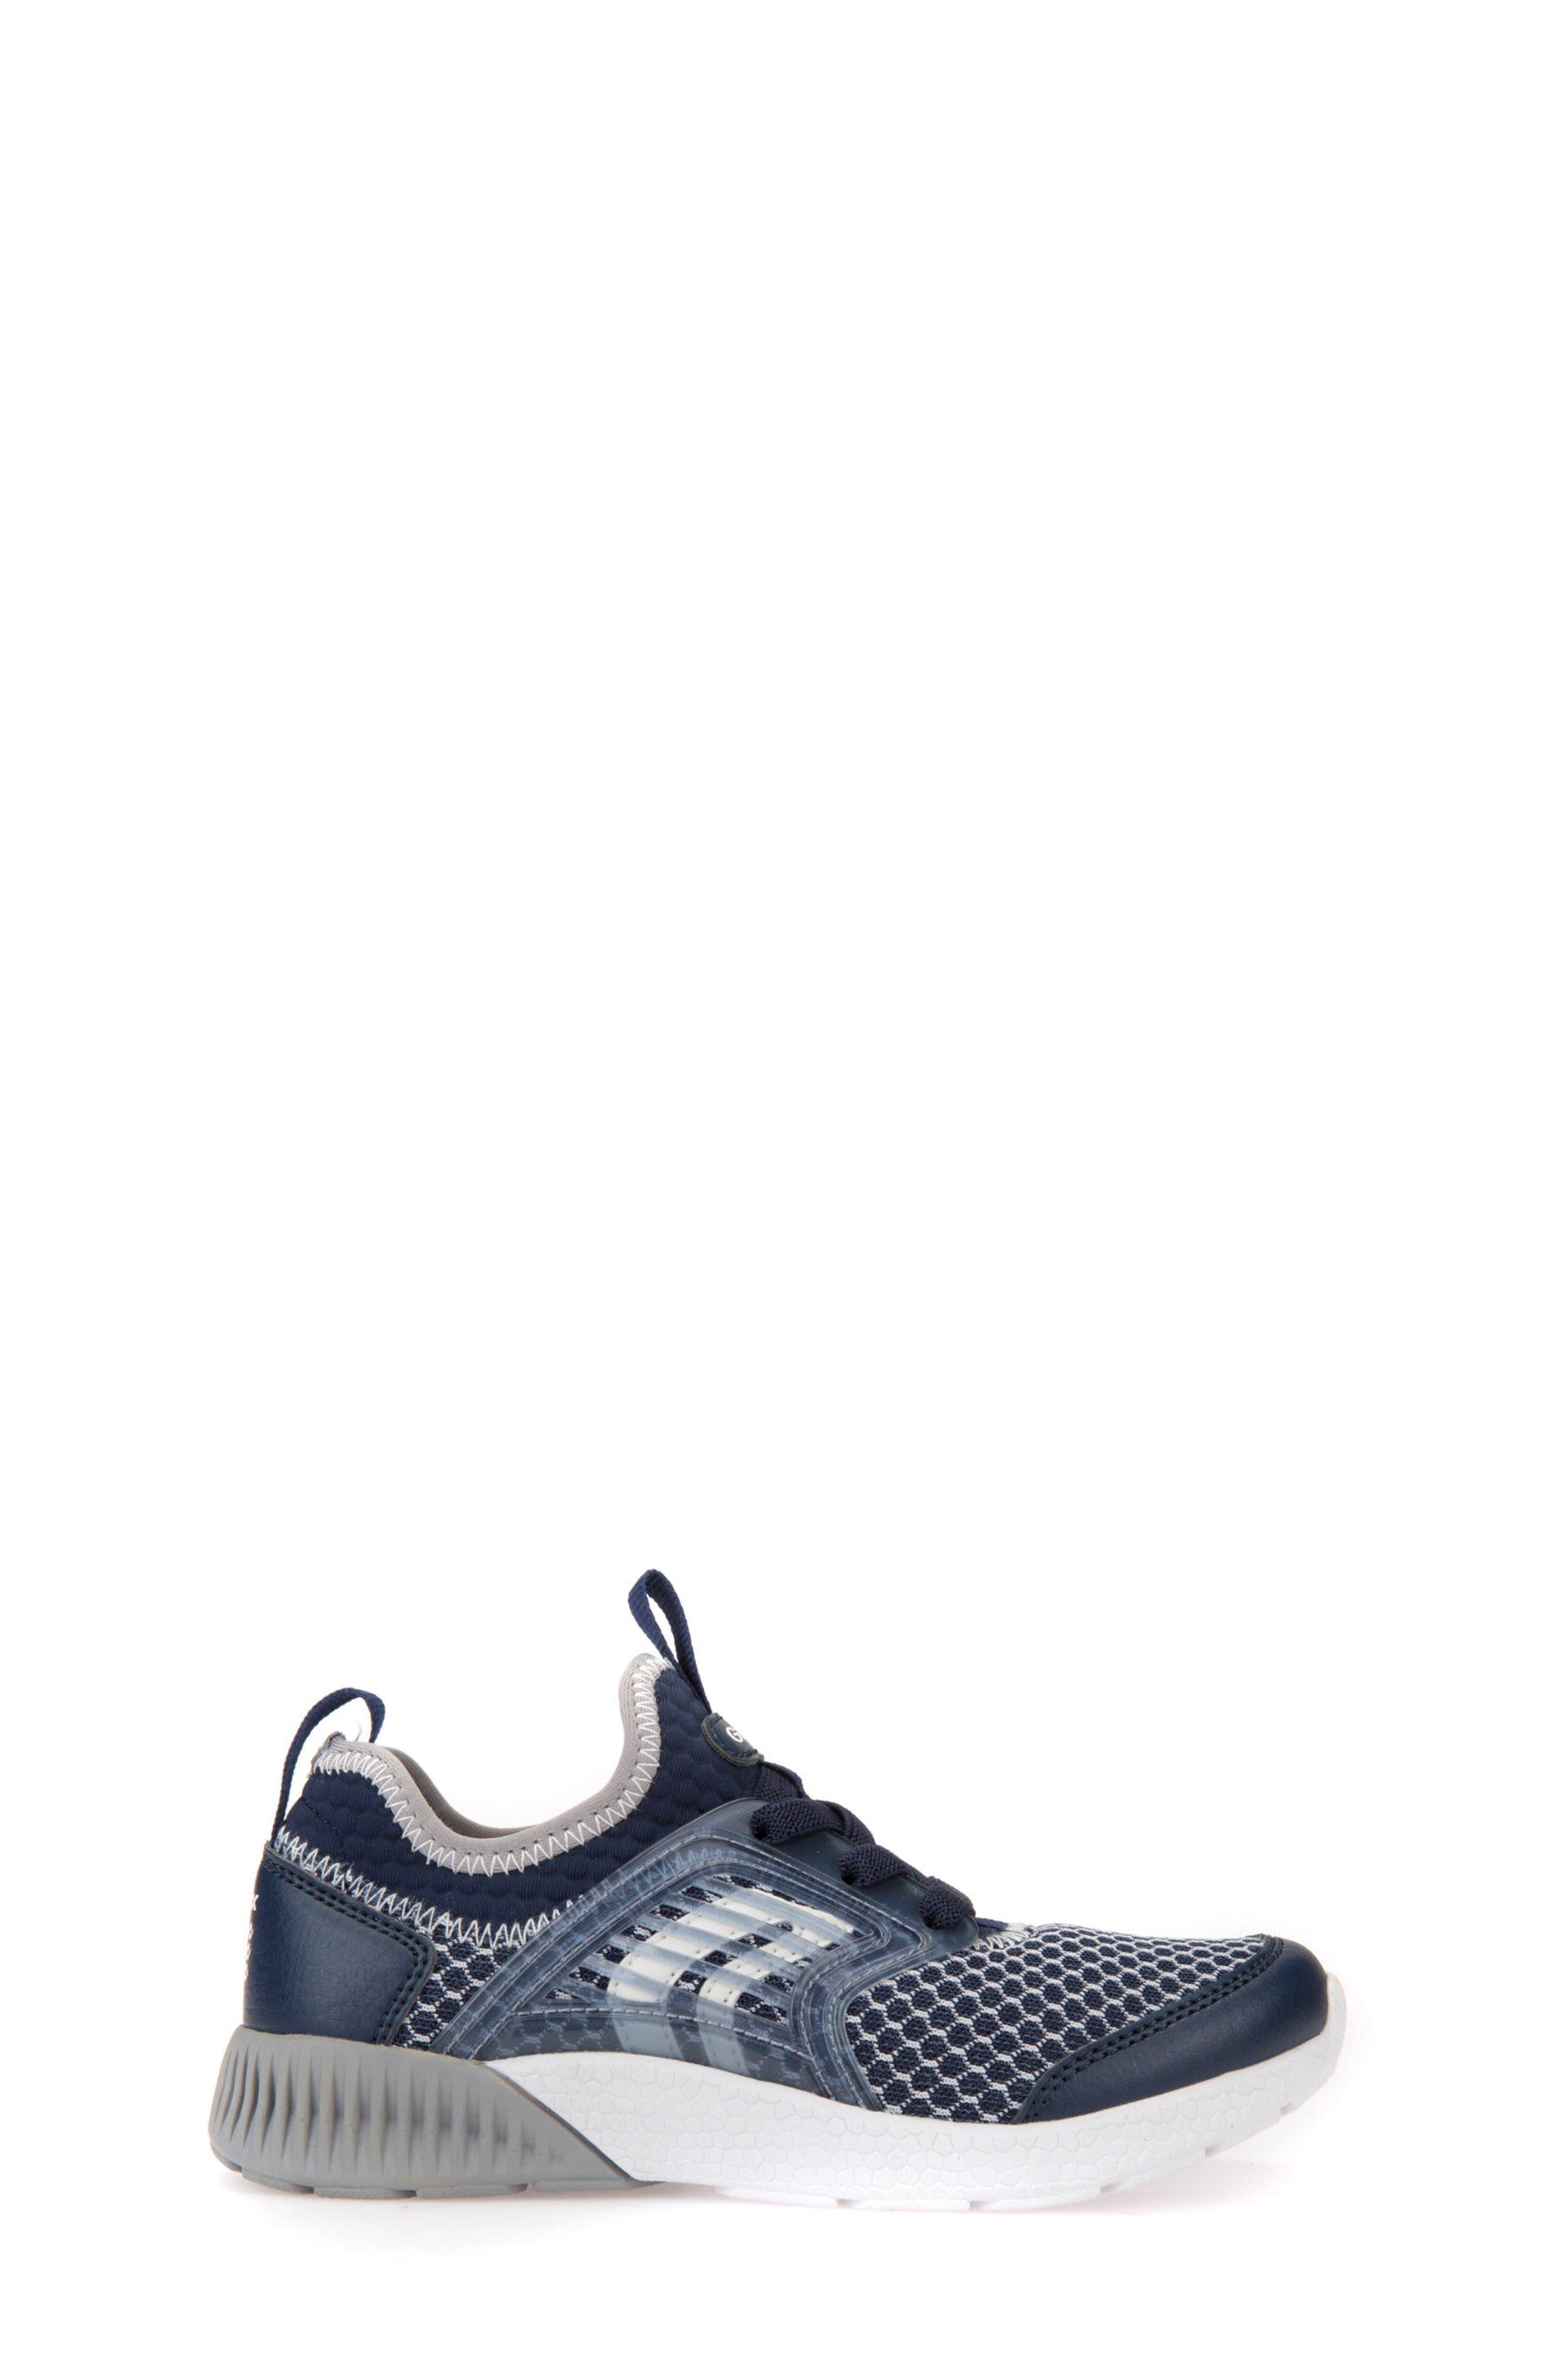 Sveth Sock Sneaker,                             Alternate thumbnail 3, color,                             Navy/ Grey